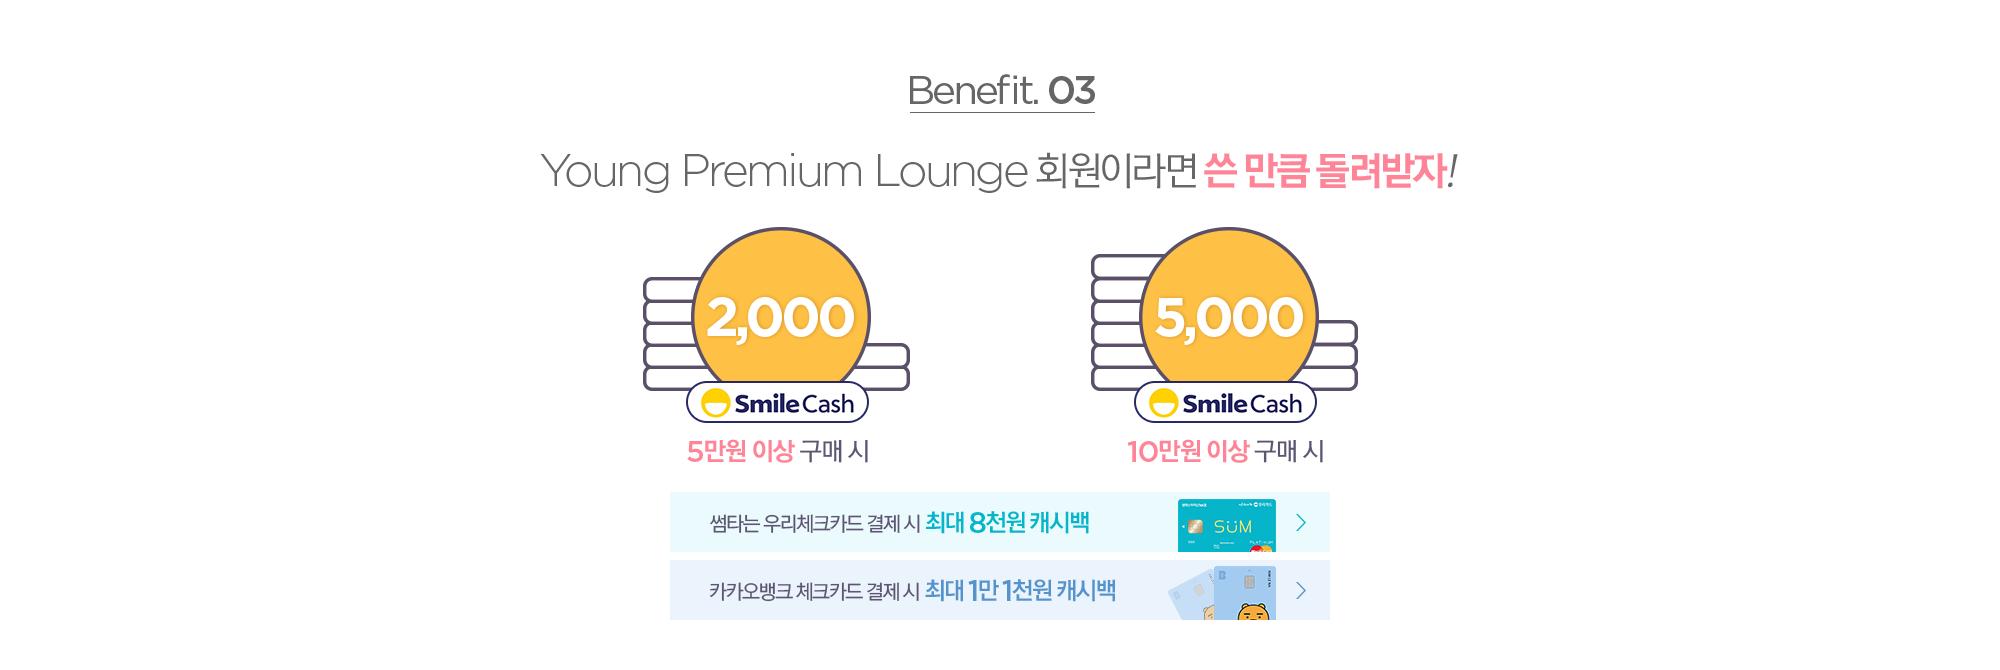 Benefit.03 Young Premium Lounge 회원이라면 쓴 만큼 돌려받자!